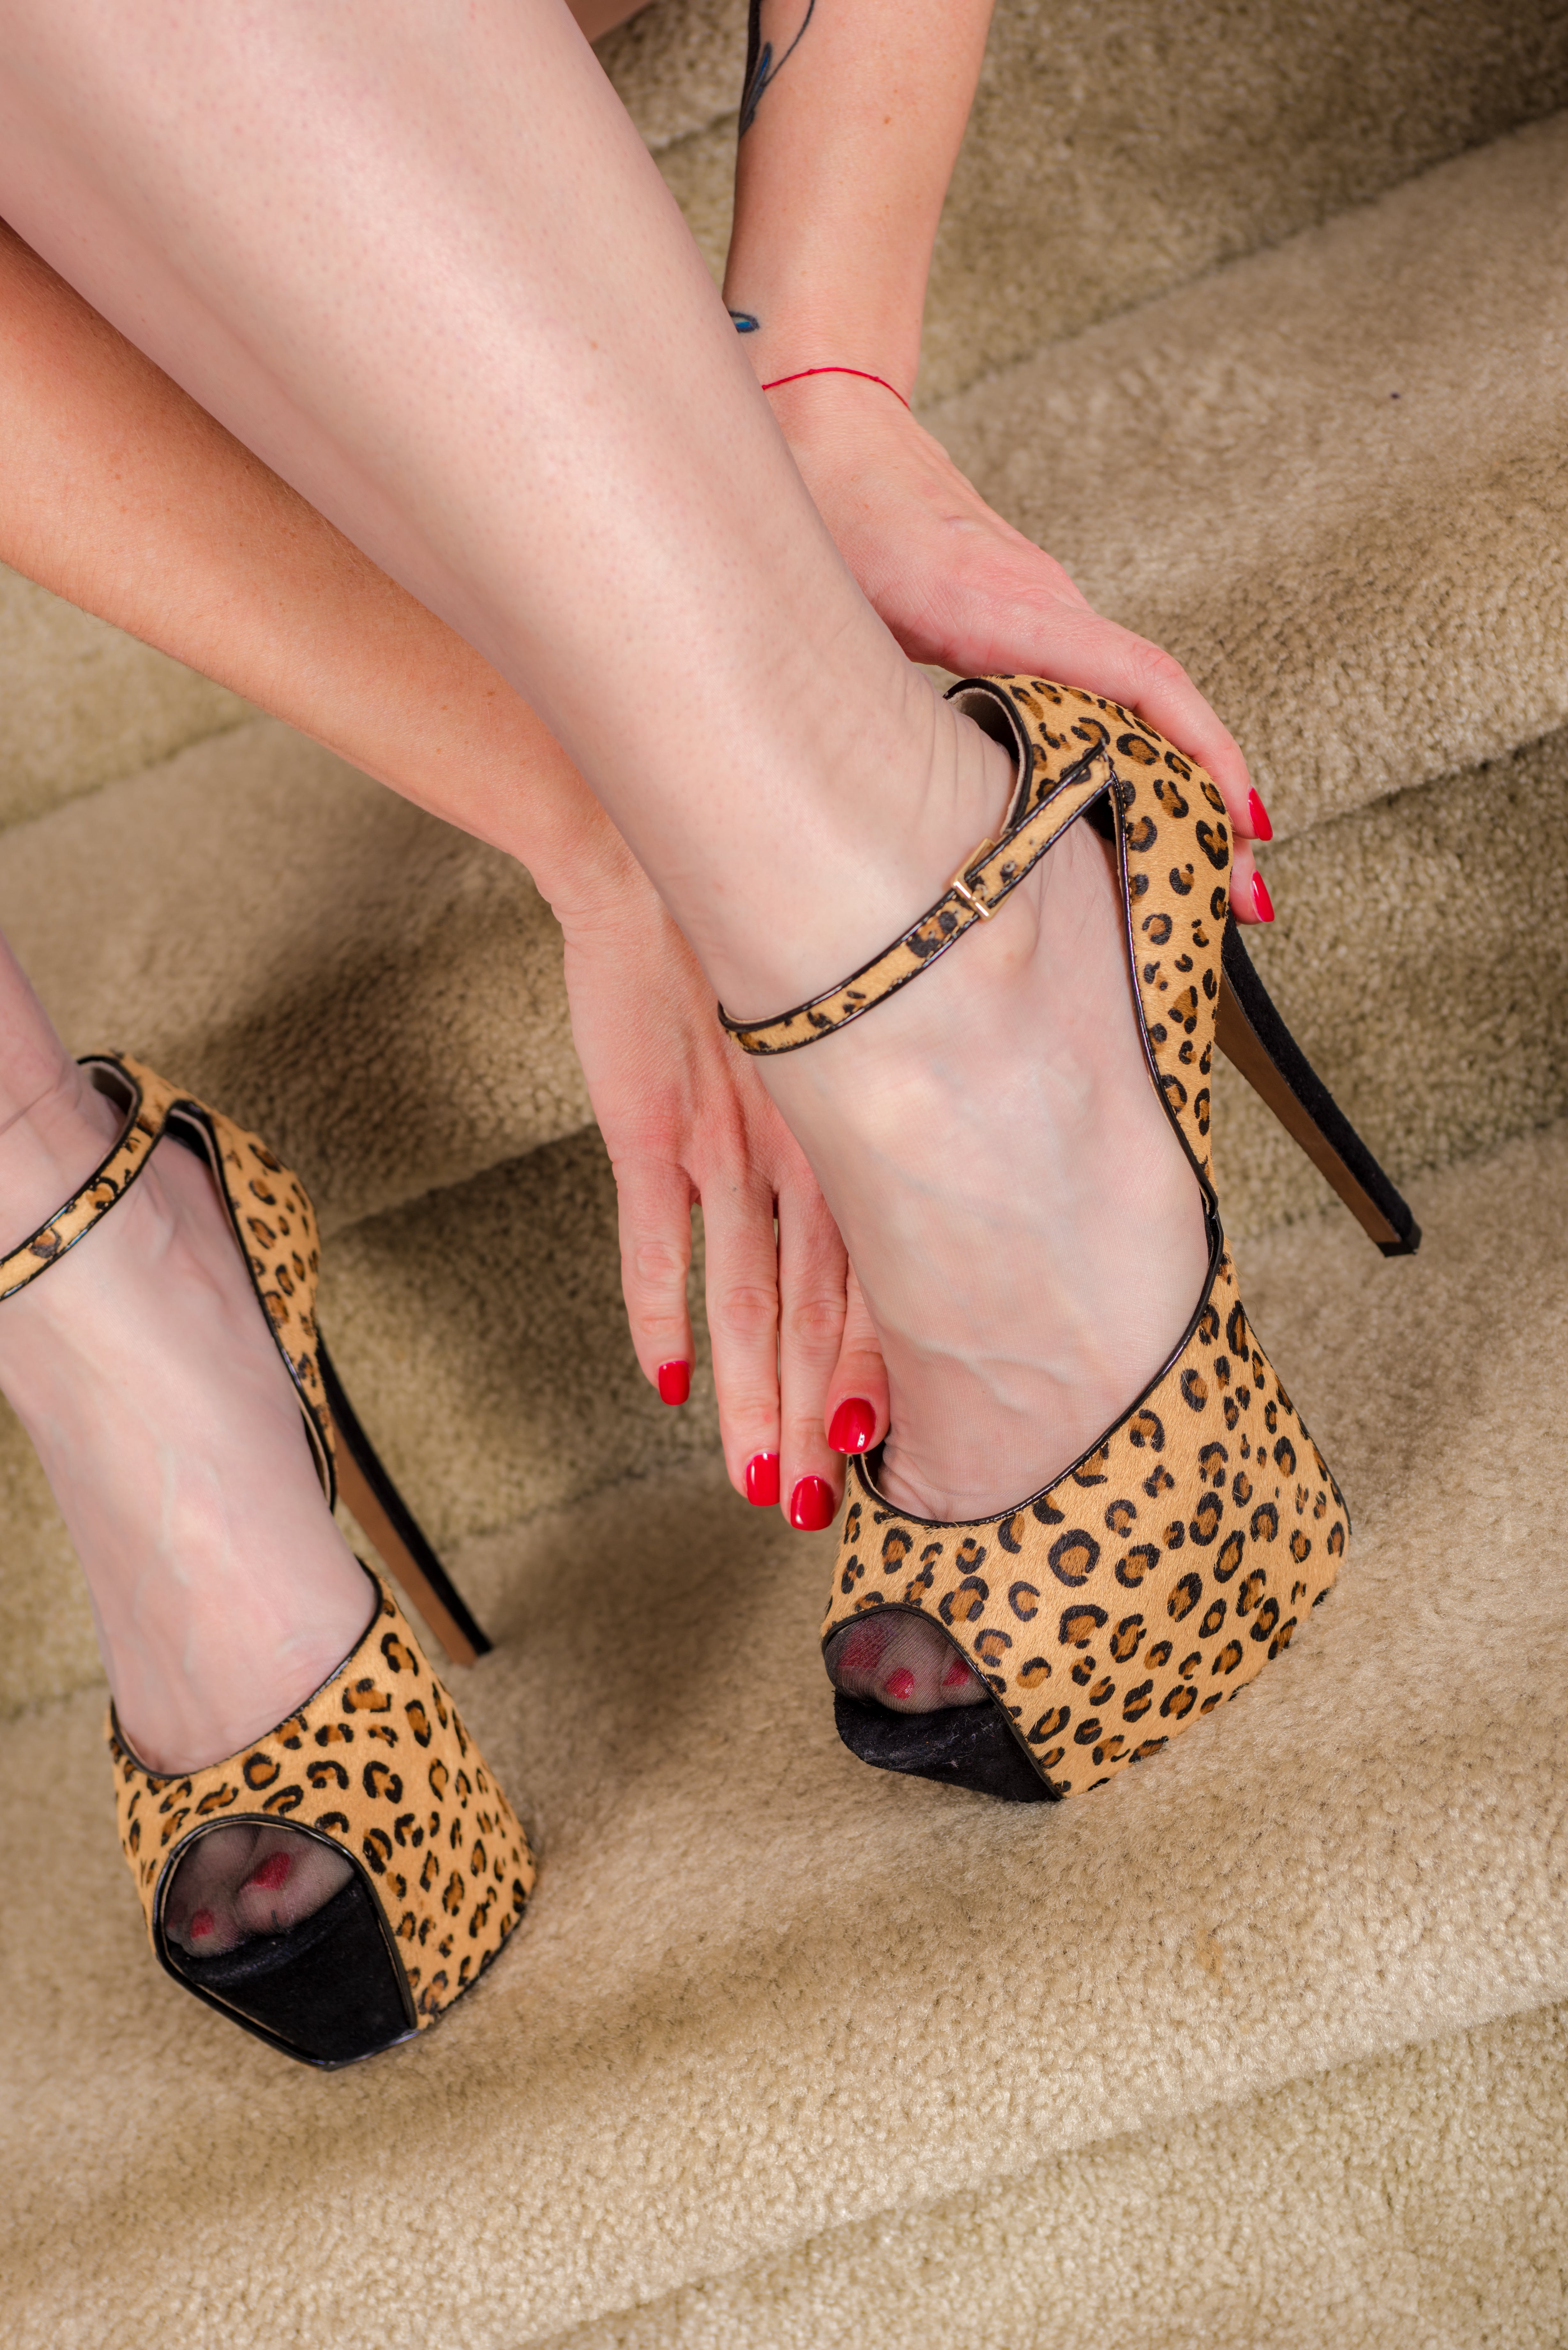 Woman Wearing Brown and Black Leopard Print Platform Ankle Strap Stilettos